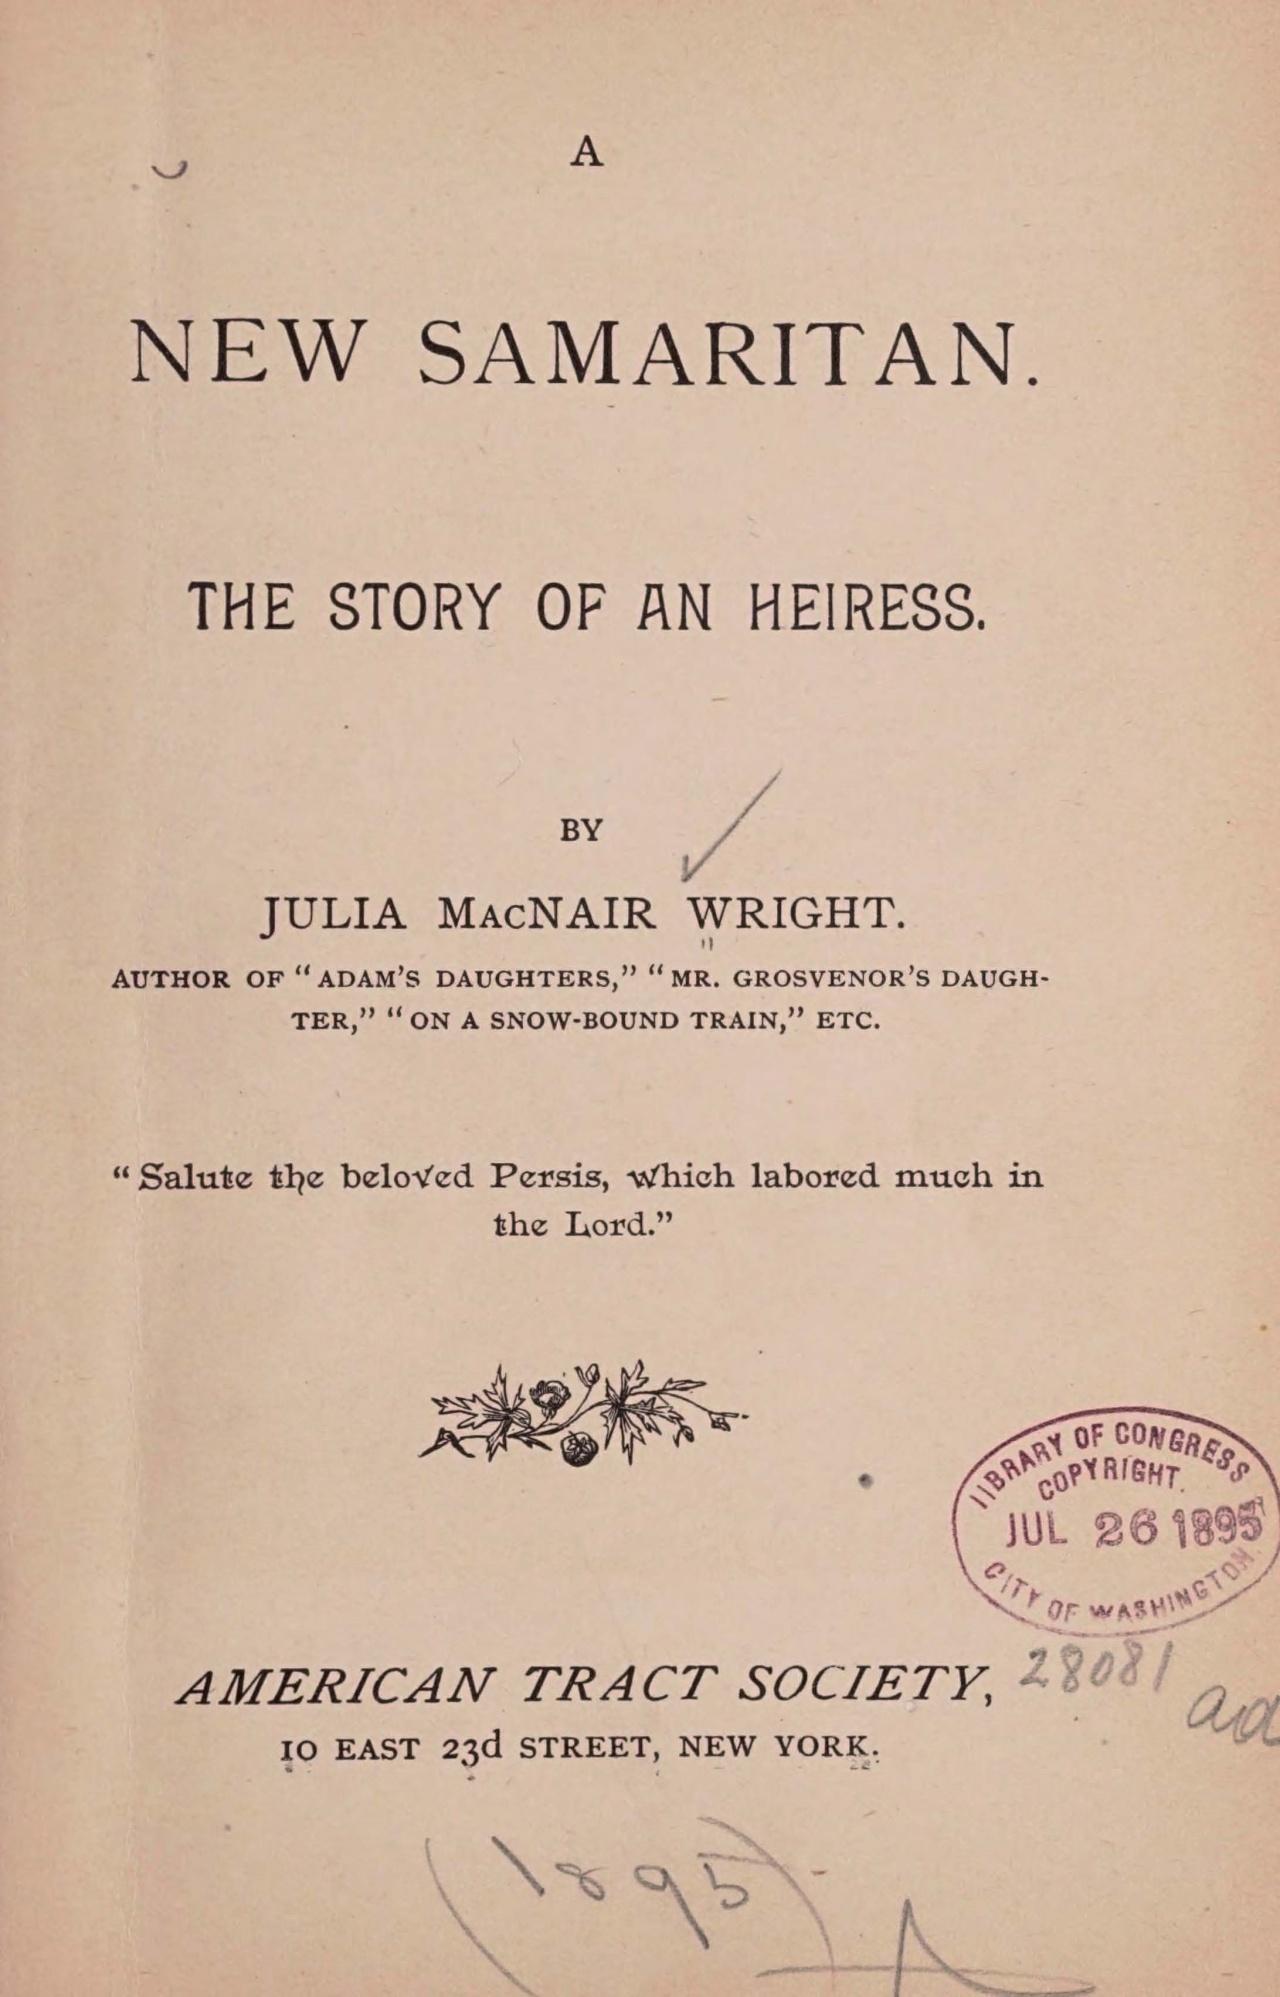 Wright, Julia McNair, A New Samaritan Title Page.jpg